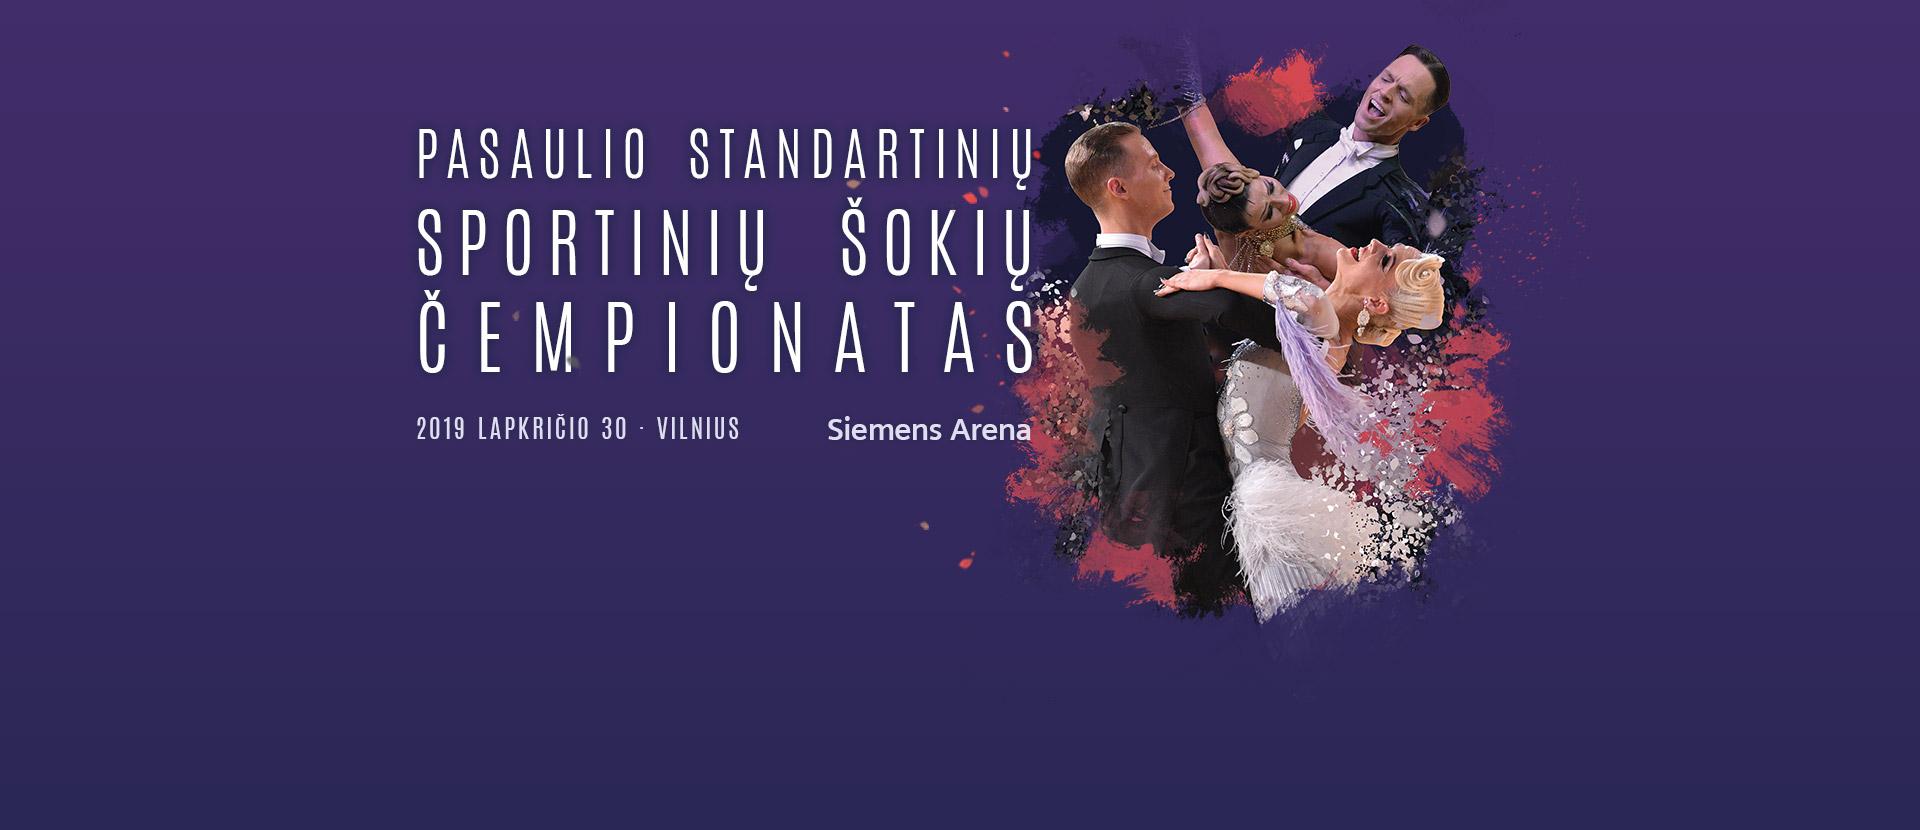 WDSF World Championship Standard 2019